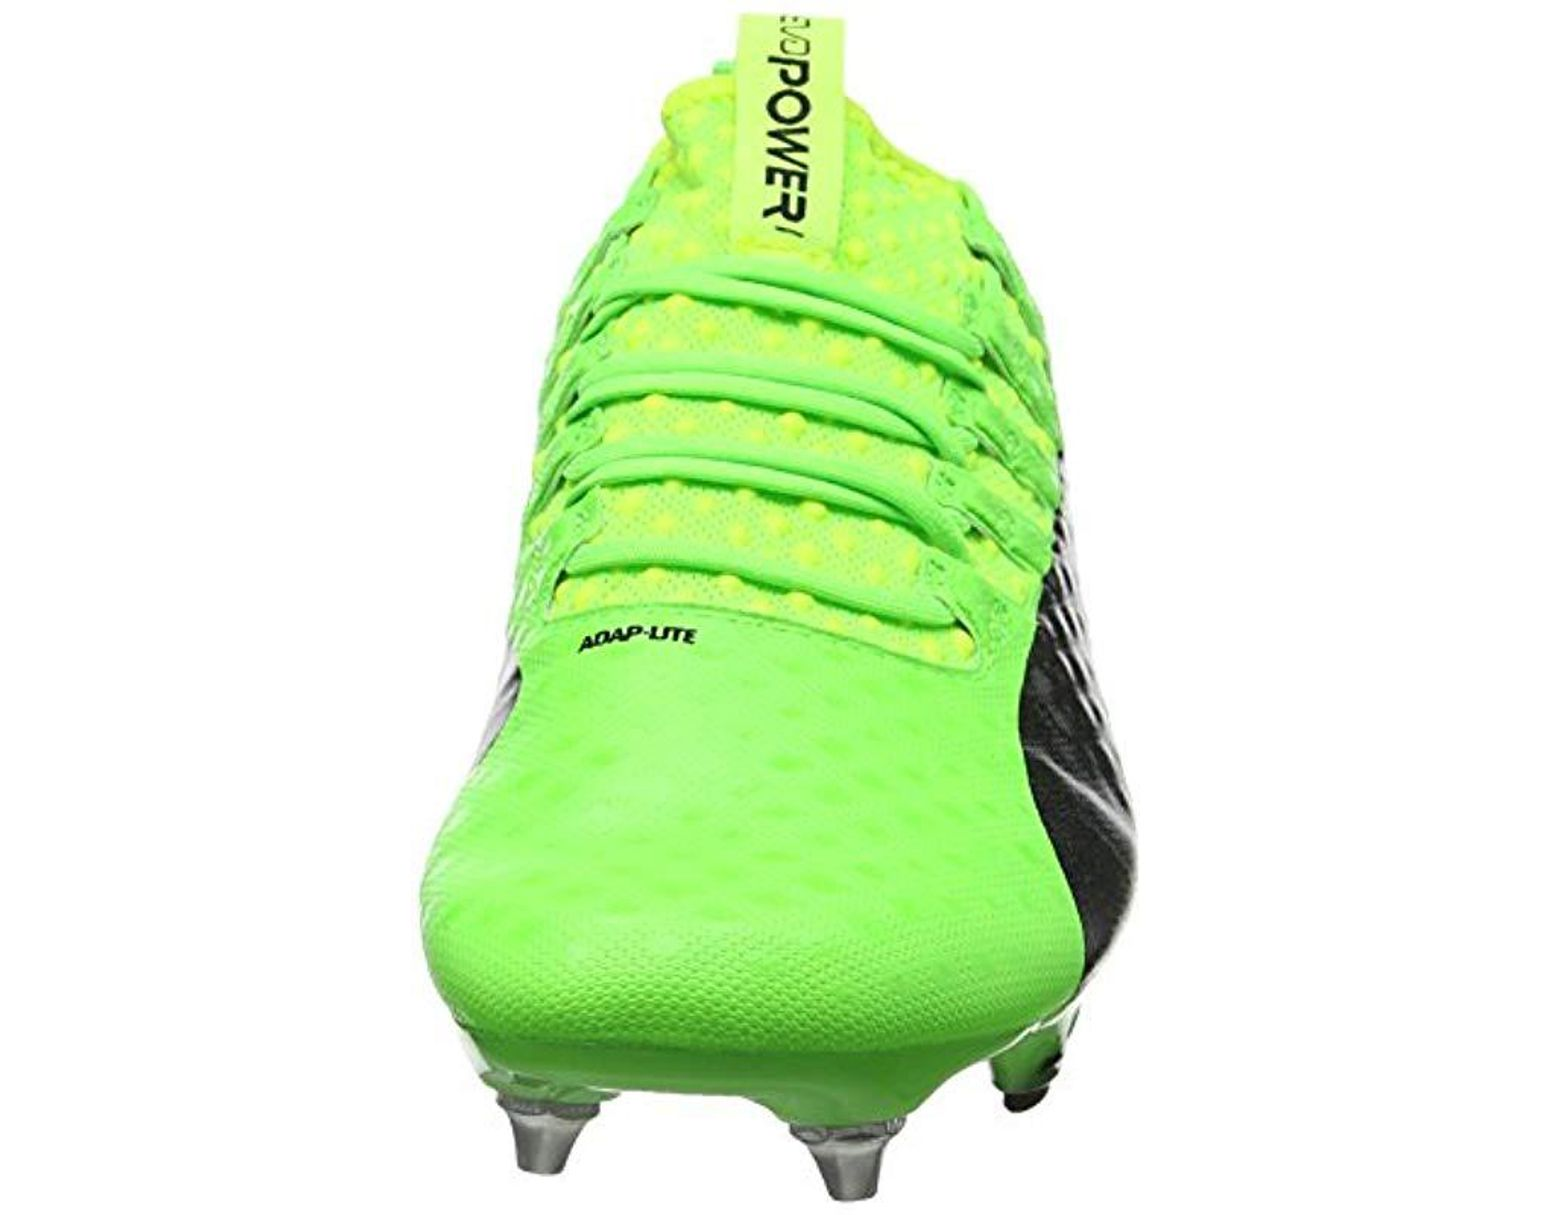 Evopower Vigor Sg Football Boots Green Men's Mx 1 8kXnw0PNO